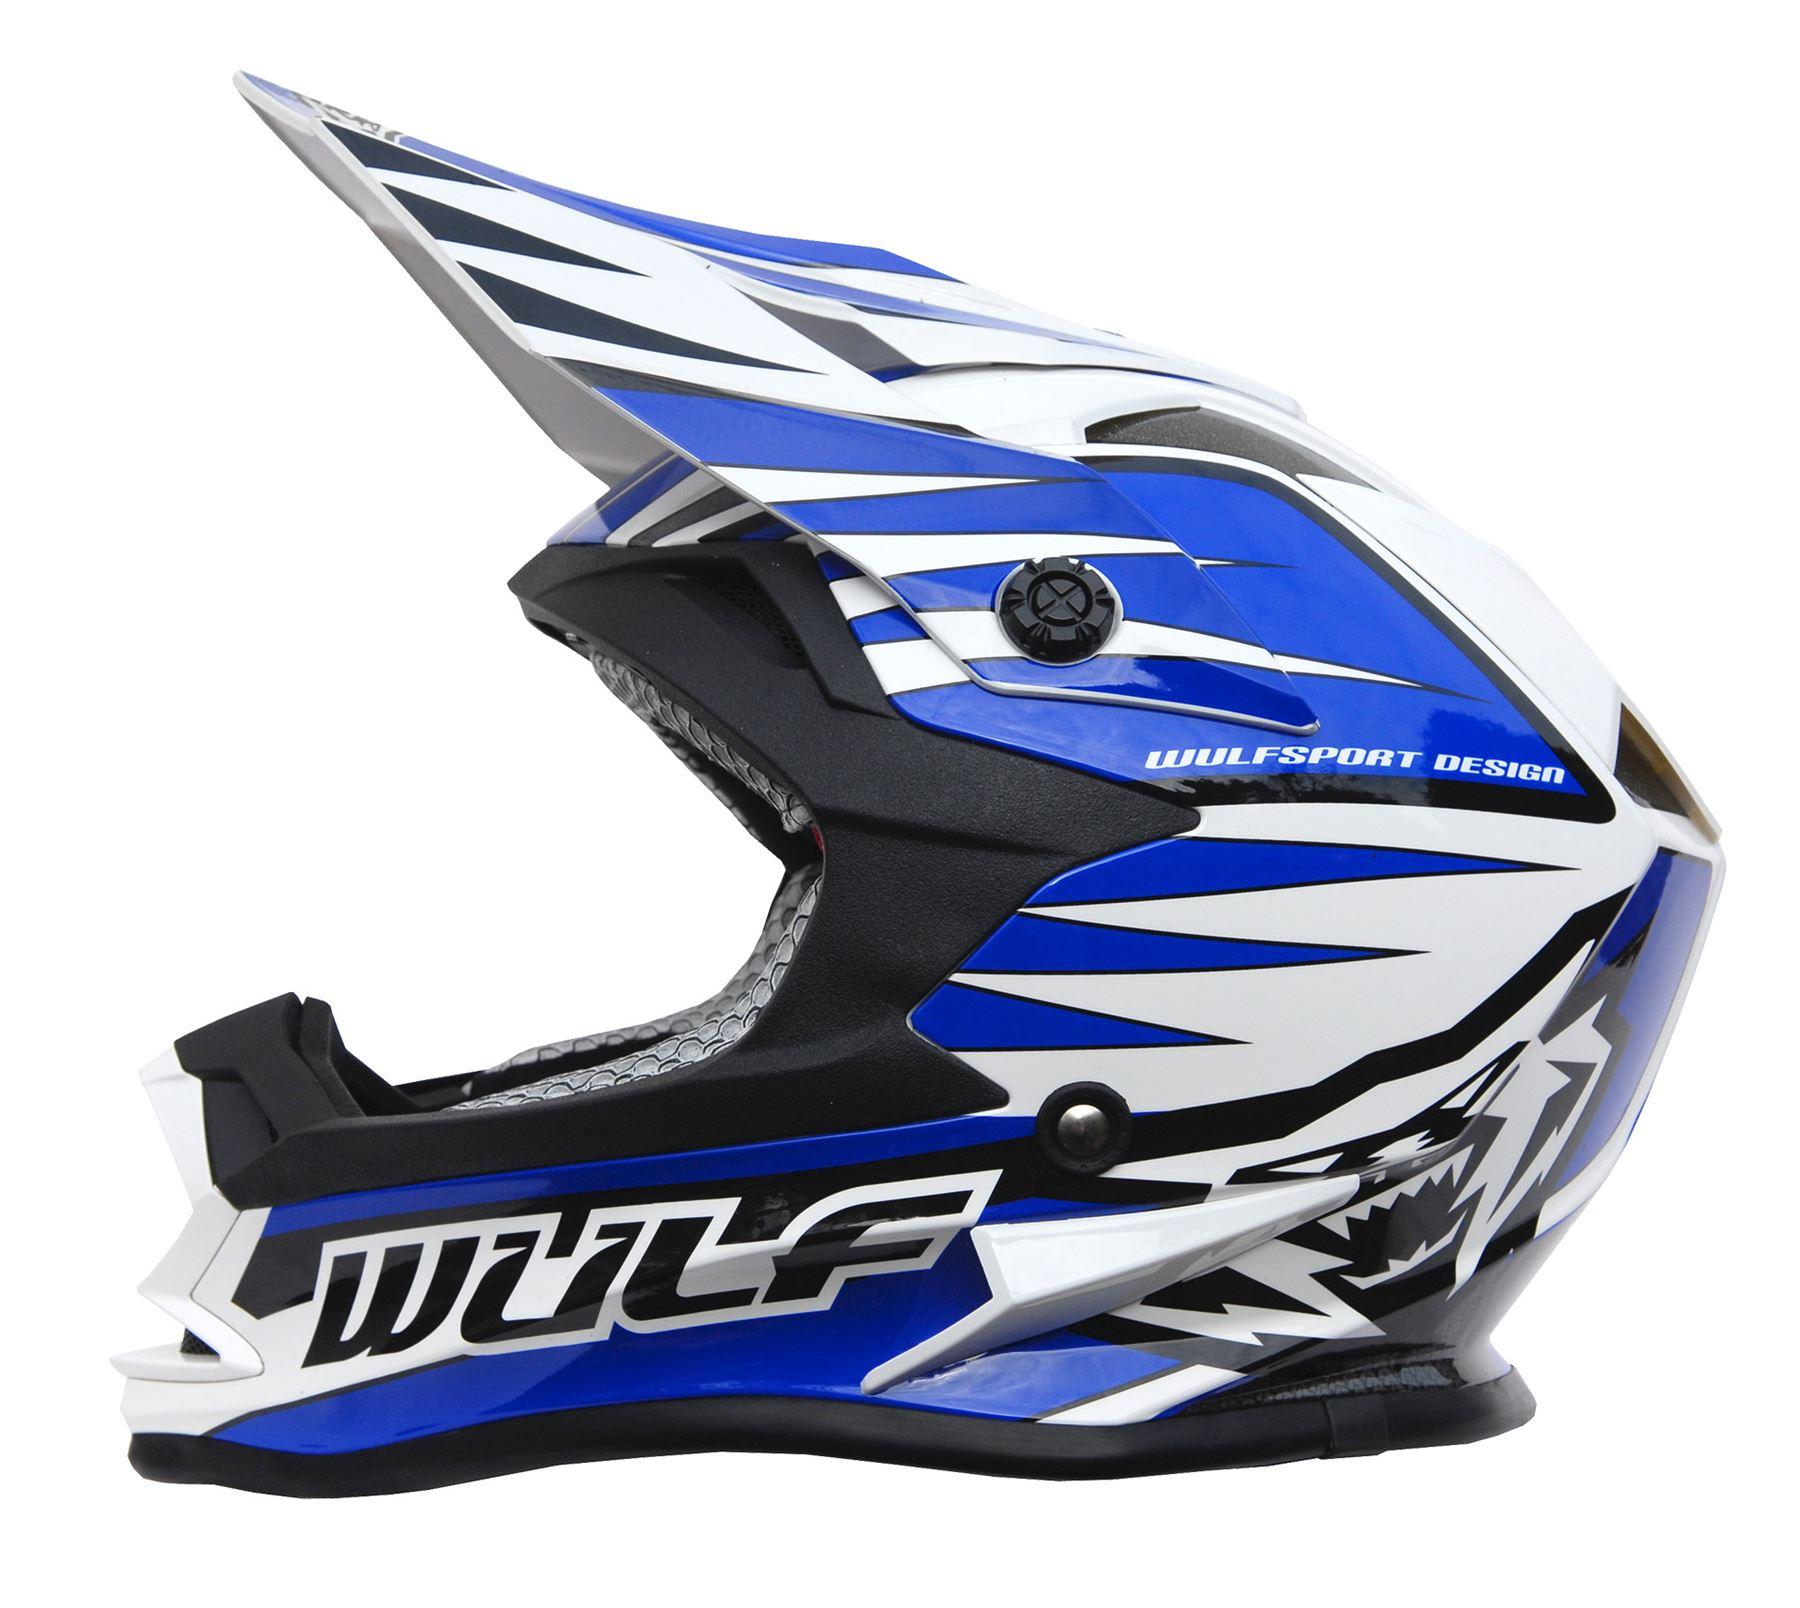 Wulfsport Cub Kids Youth Advance ACU Gold Off Road  : 9db9afec 91b1 43ce bfa8 69ba195cf5d9 <strong>Lightest Dot</strong> Motorcycle Helmet from www.ebay.co.uk size 1800 x 1608 jpeg 217kB